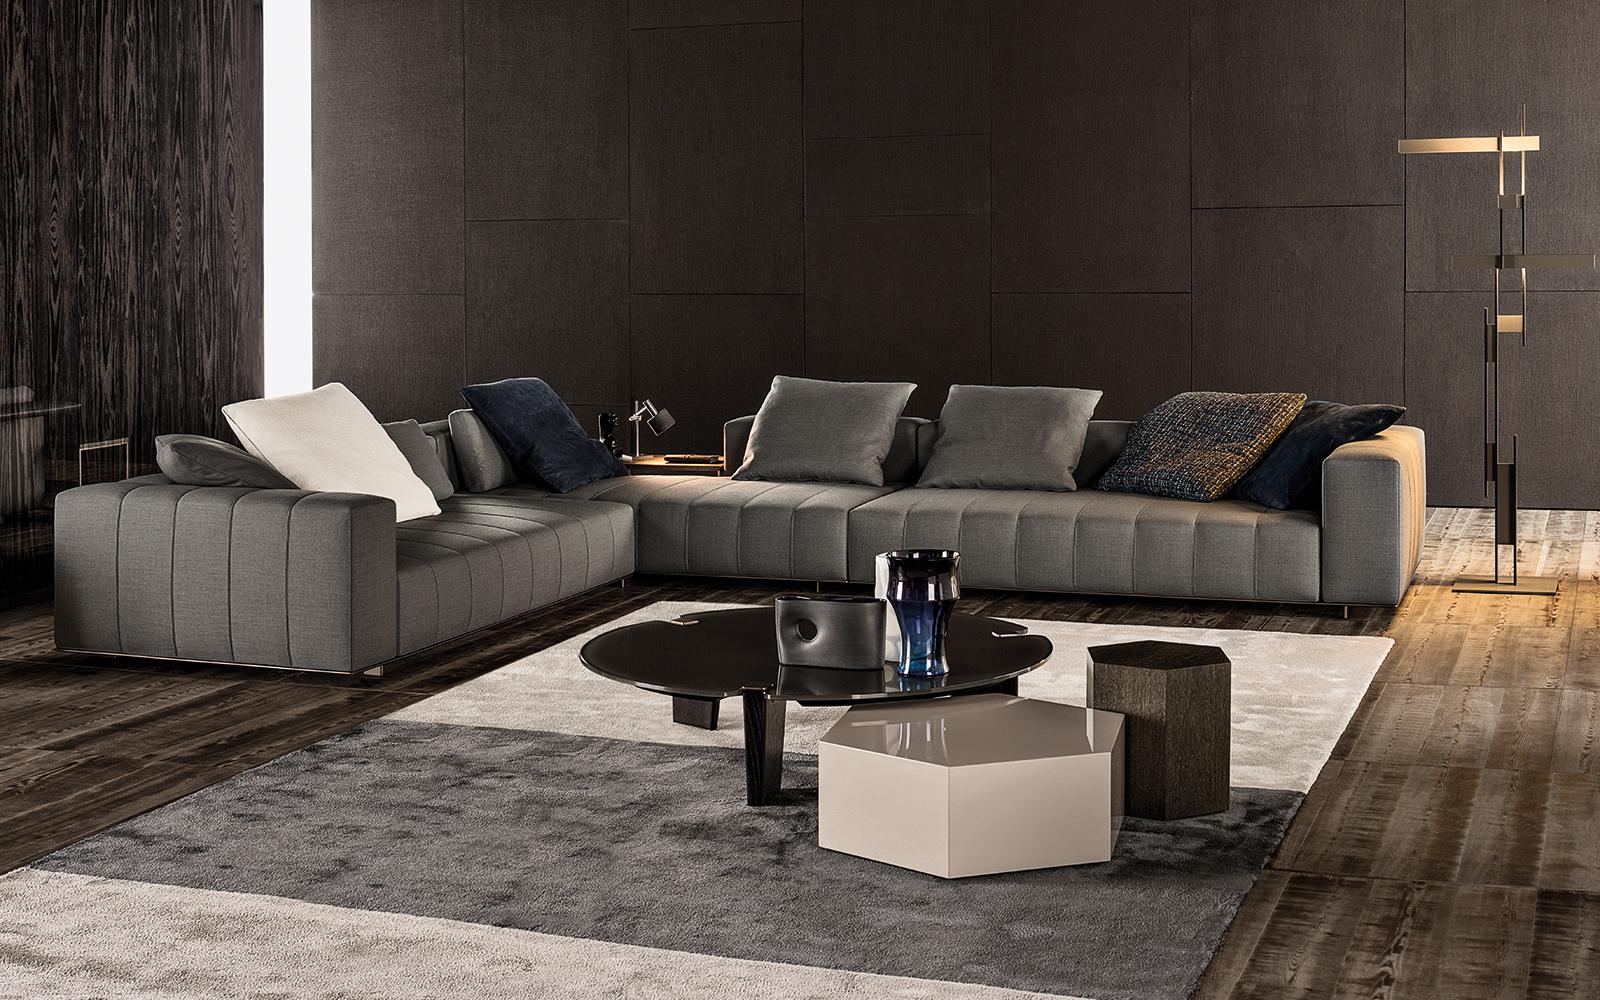 contemporary leather sofa sleeper sofas austin tx freeman tailor| designed by; rodolfo dordini, minotti ...